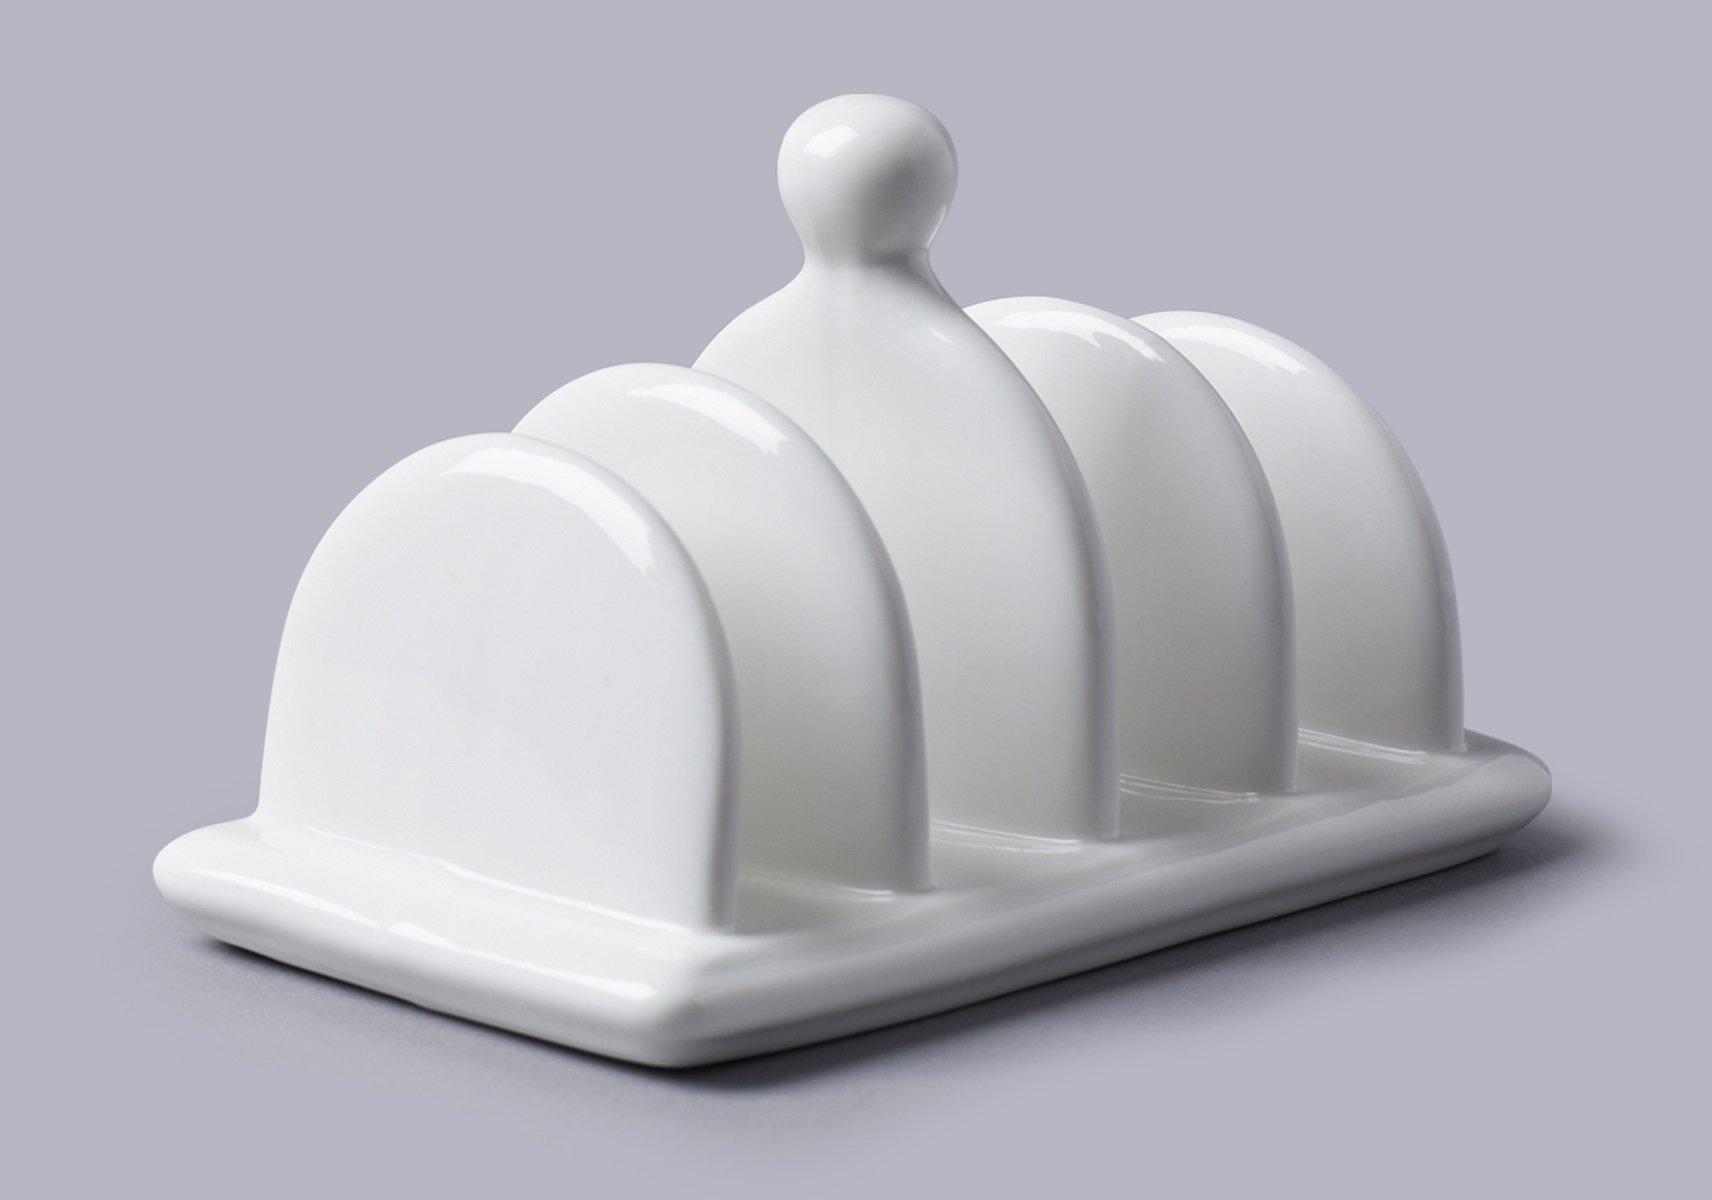 White Ceramic Toast Rack by CKS